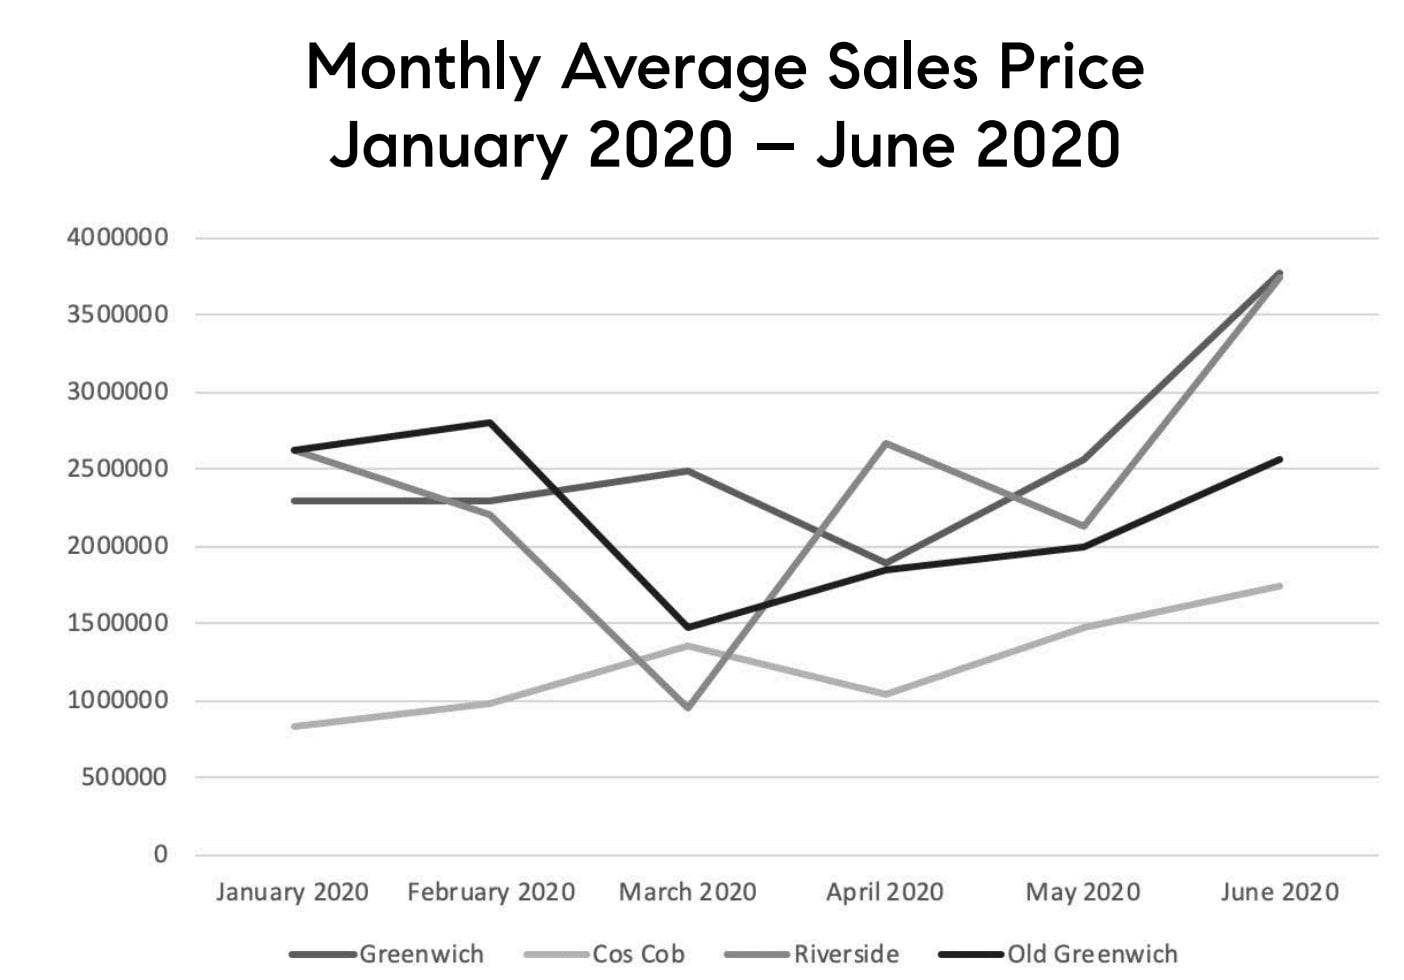 Monthly Average Sale Price